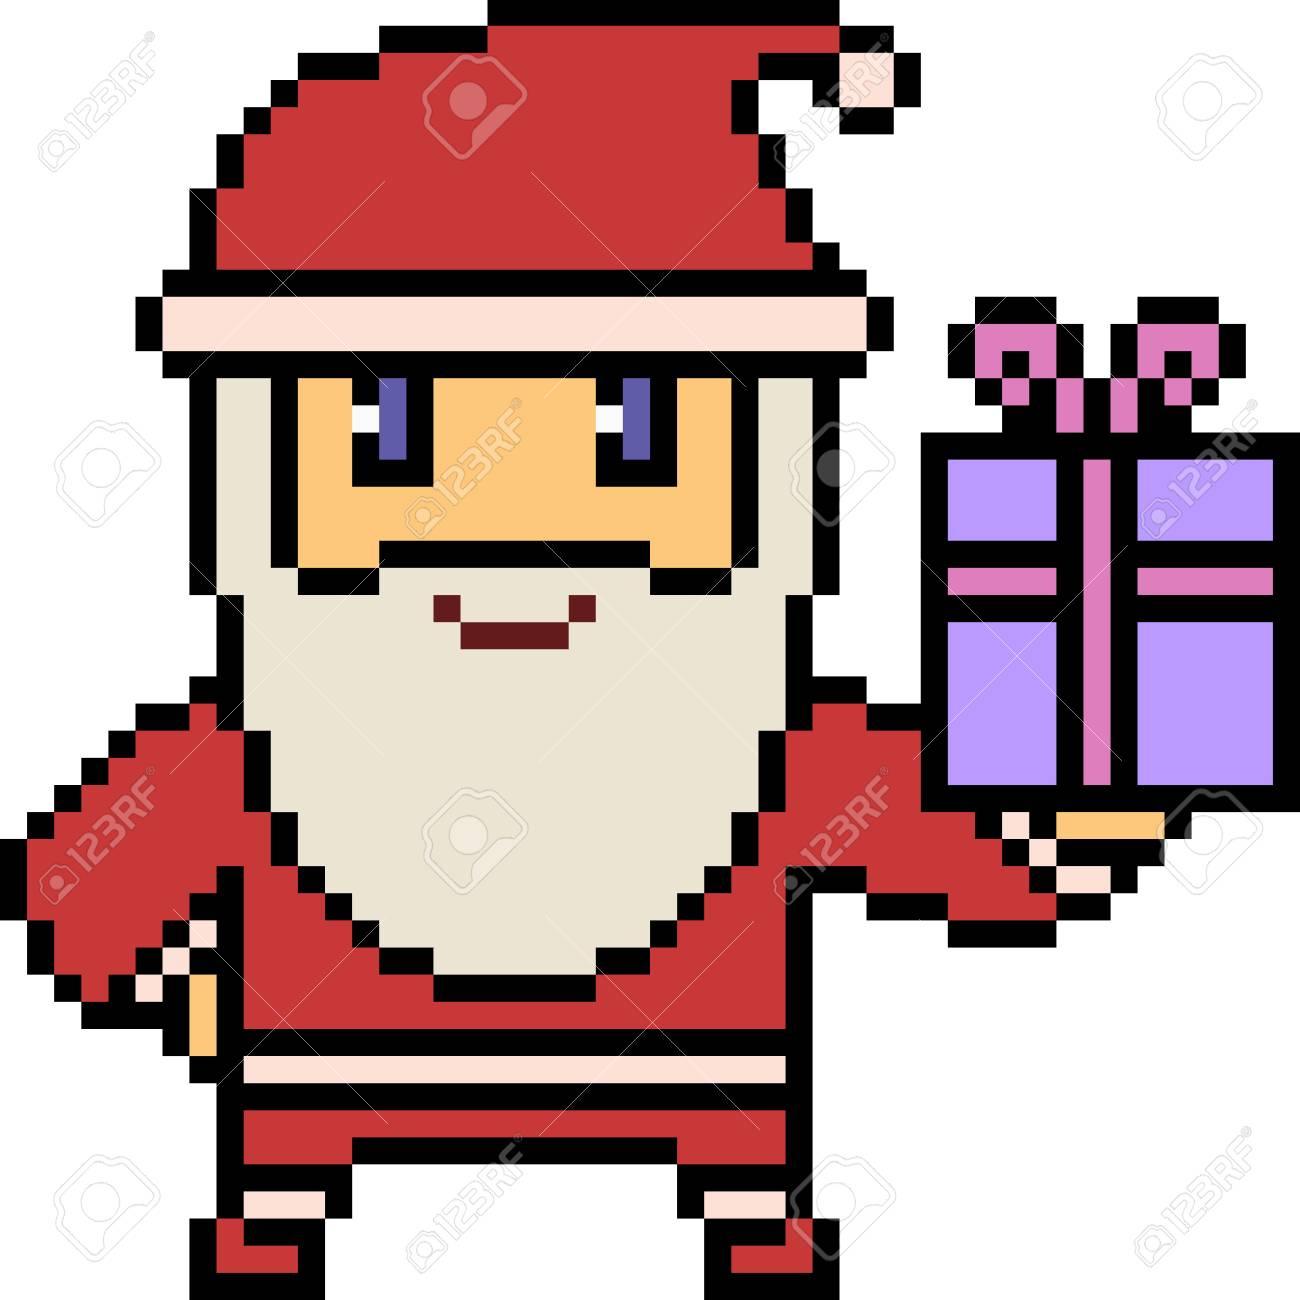 Pixel Art Illustration Of Santa Holding A Box Of Gift. dedans Pixel Art De Noël